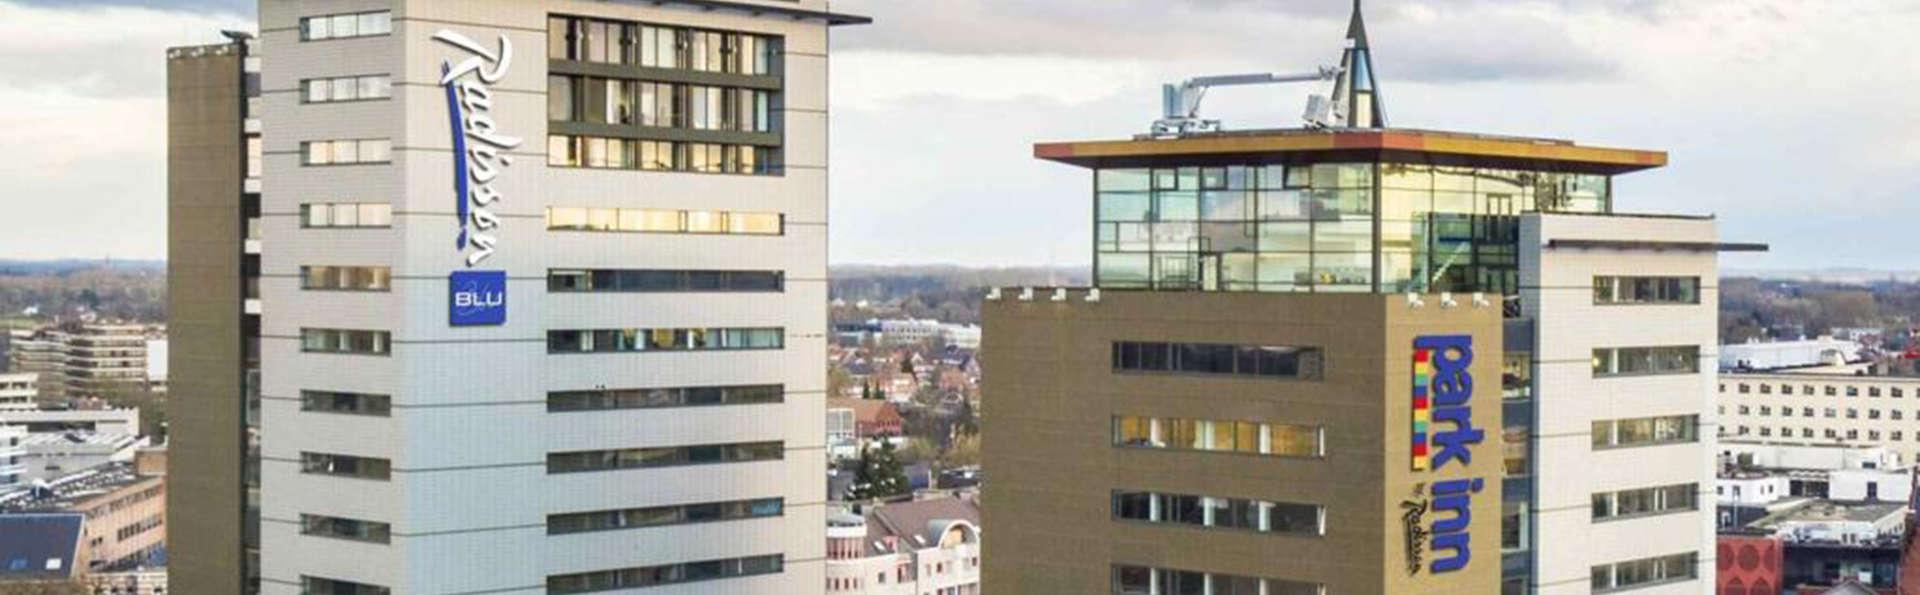 Radisson Blu Hotel Hasselt  - EDIT_256880484.jpg